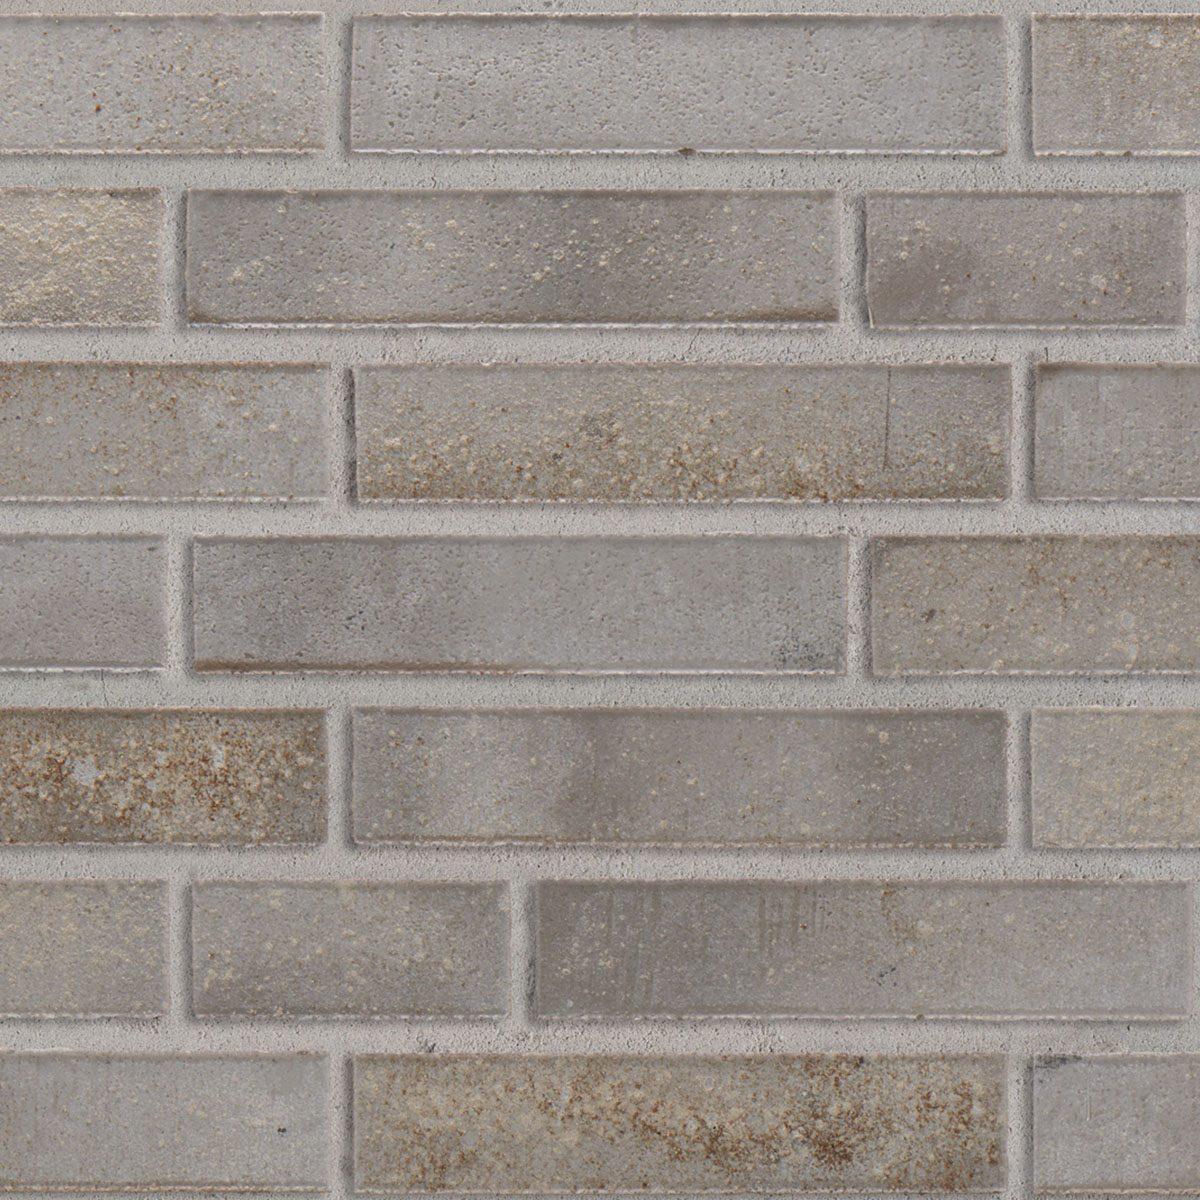 KLAY Tiles Facades - KLAY_KBS-SWA-2116-Tin-Grey